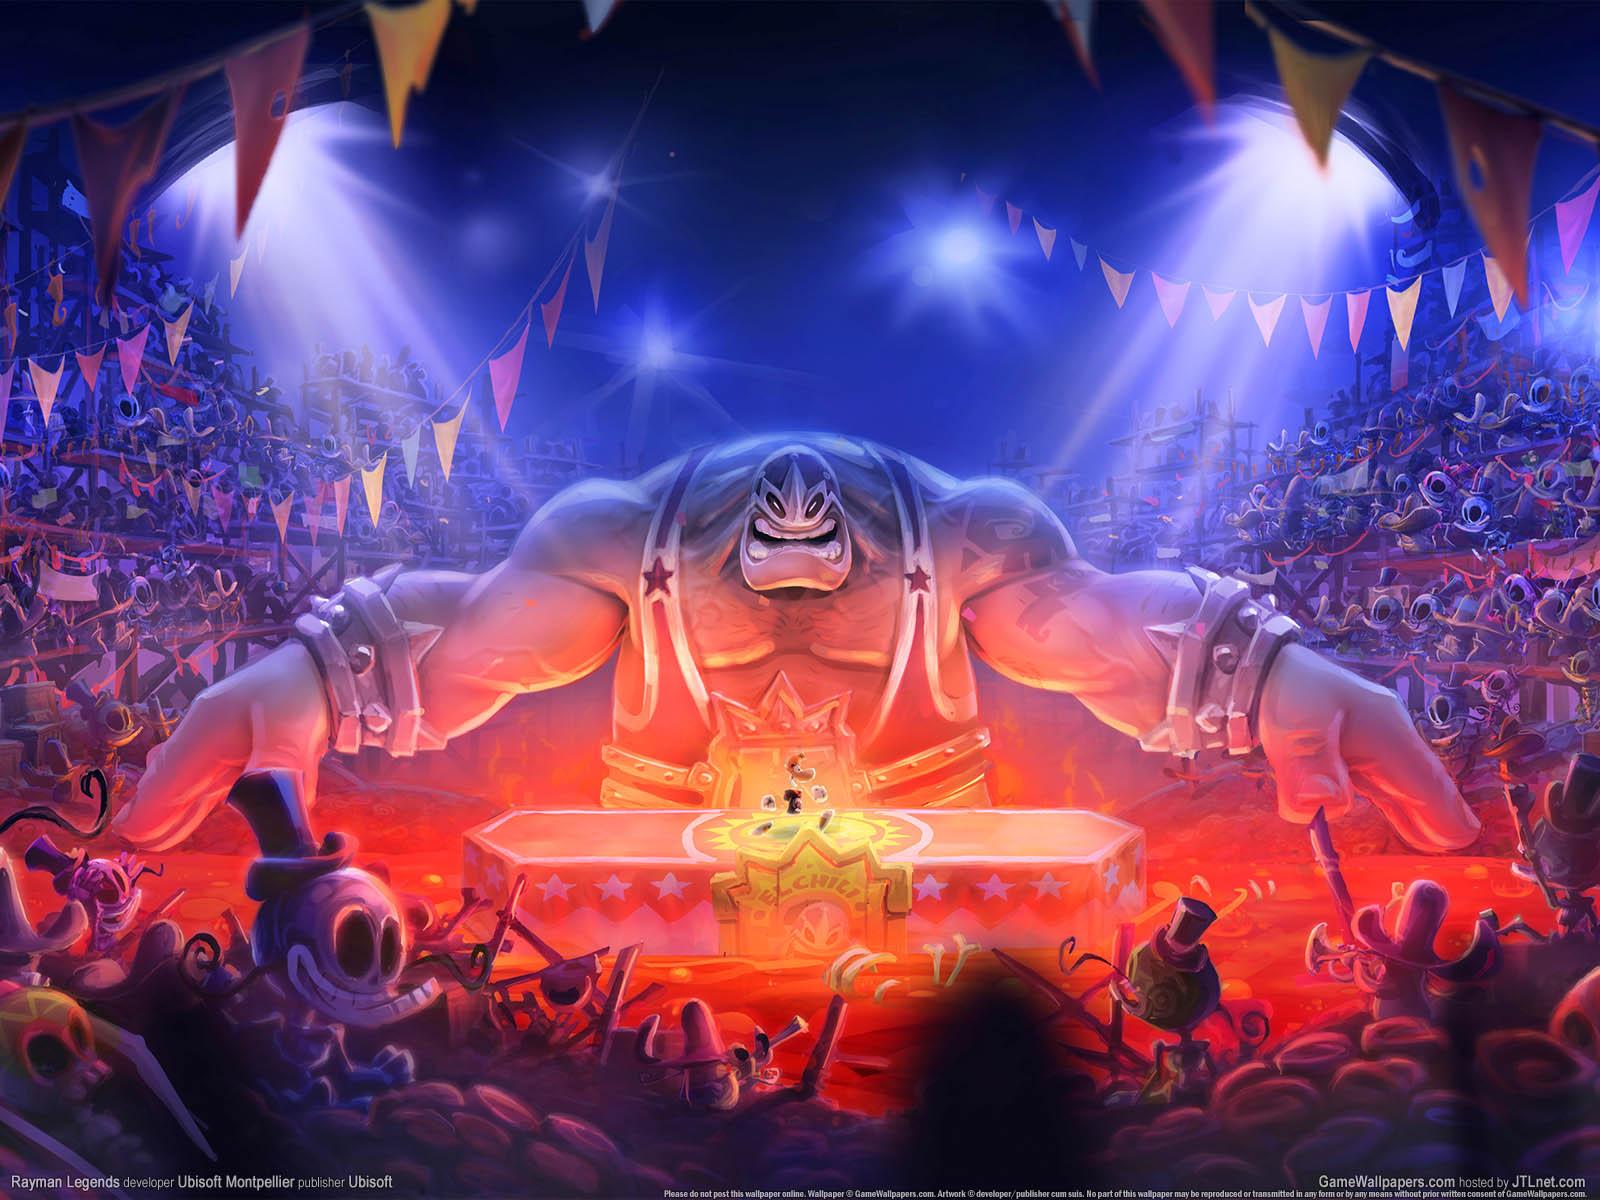 Rayman Legendsνmmer=01 achtergrond  1600x1200